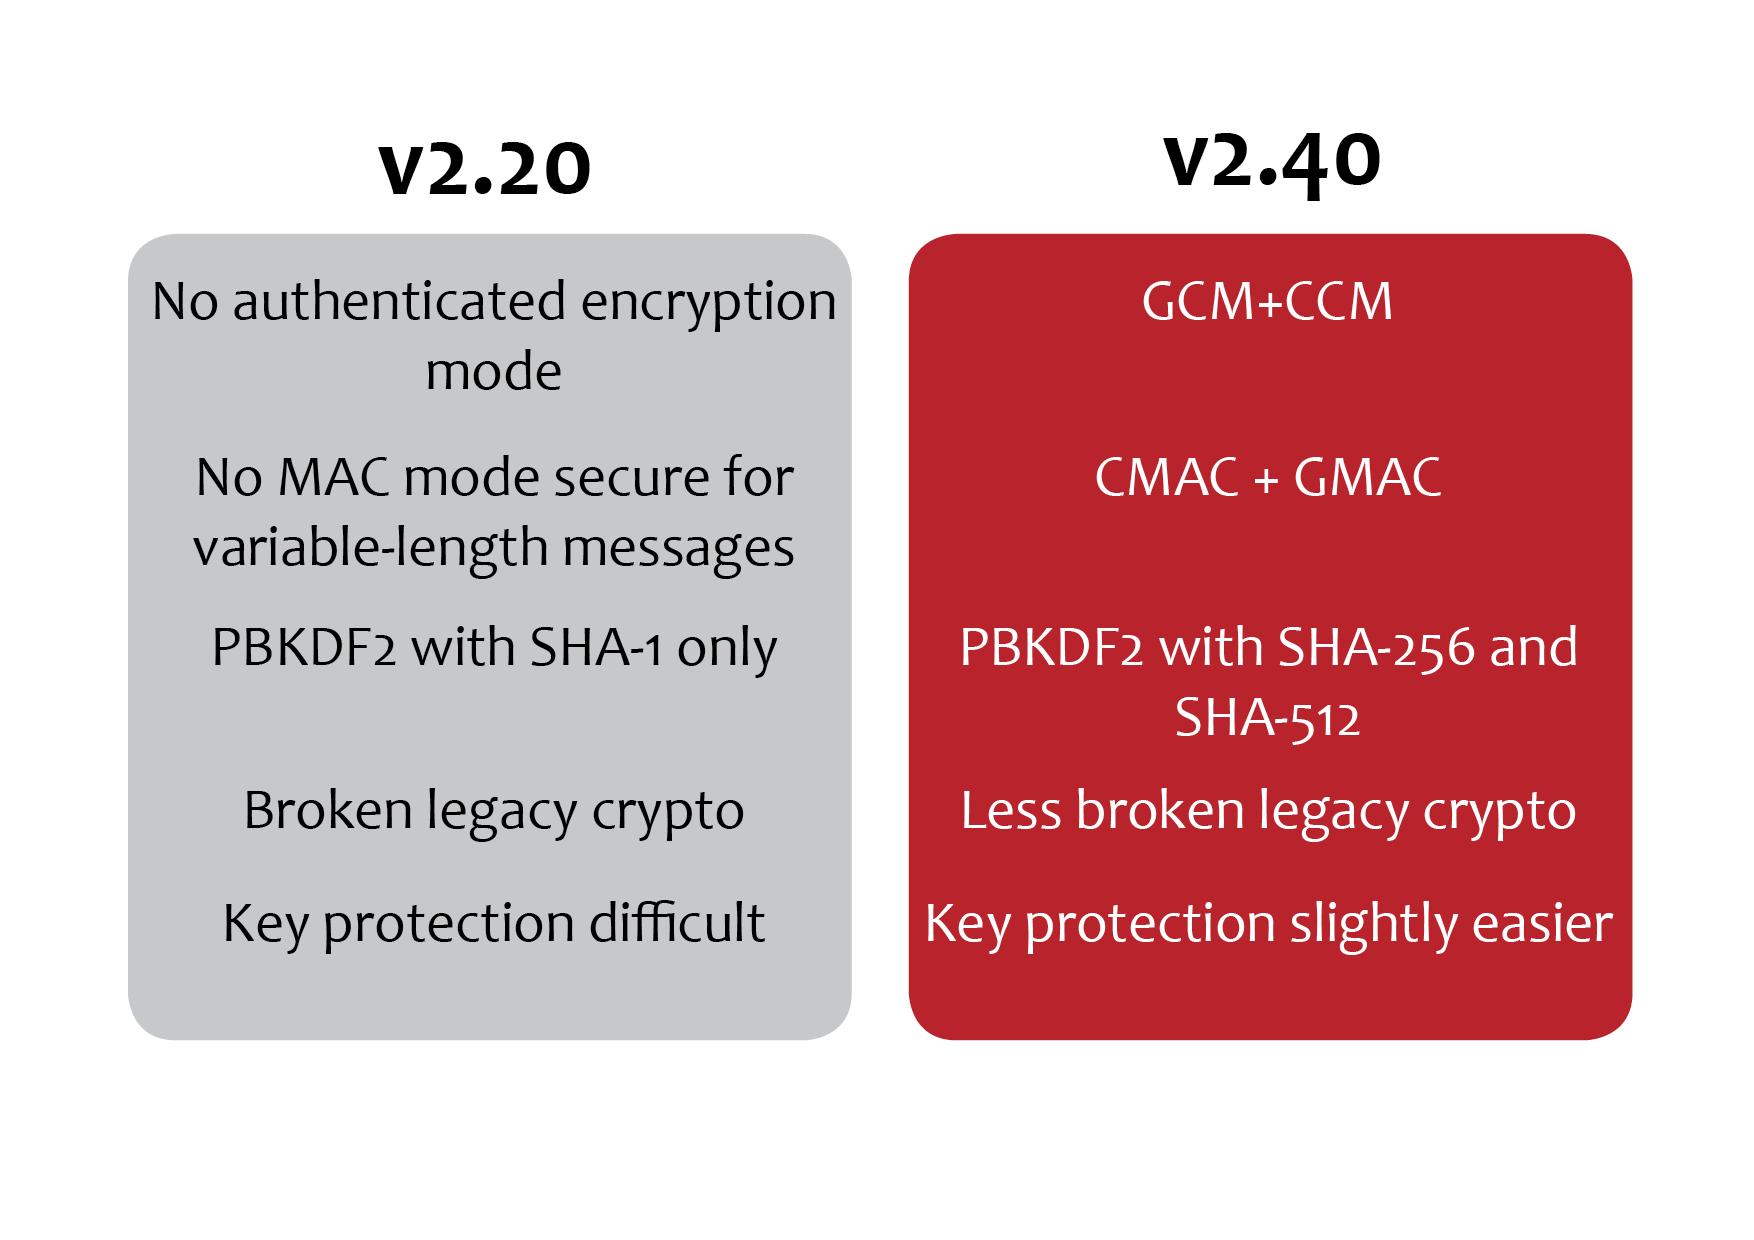 Comparing v2.40 to v2.20